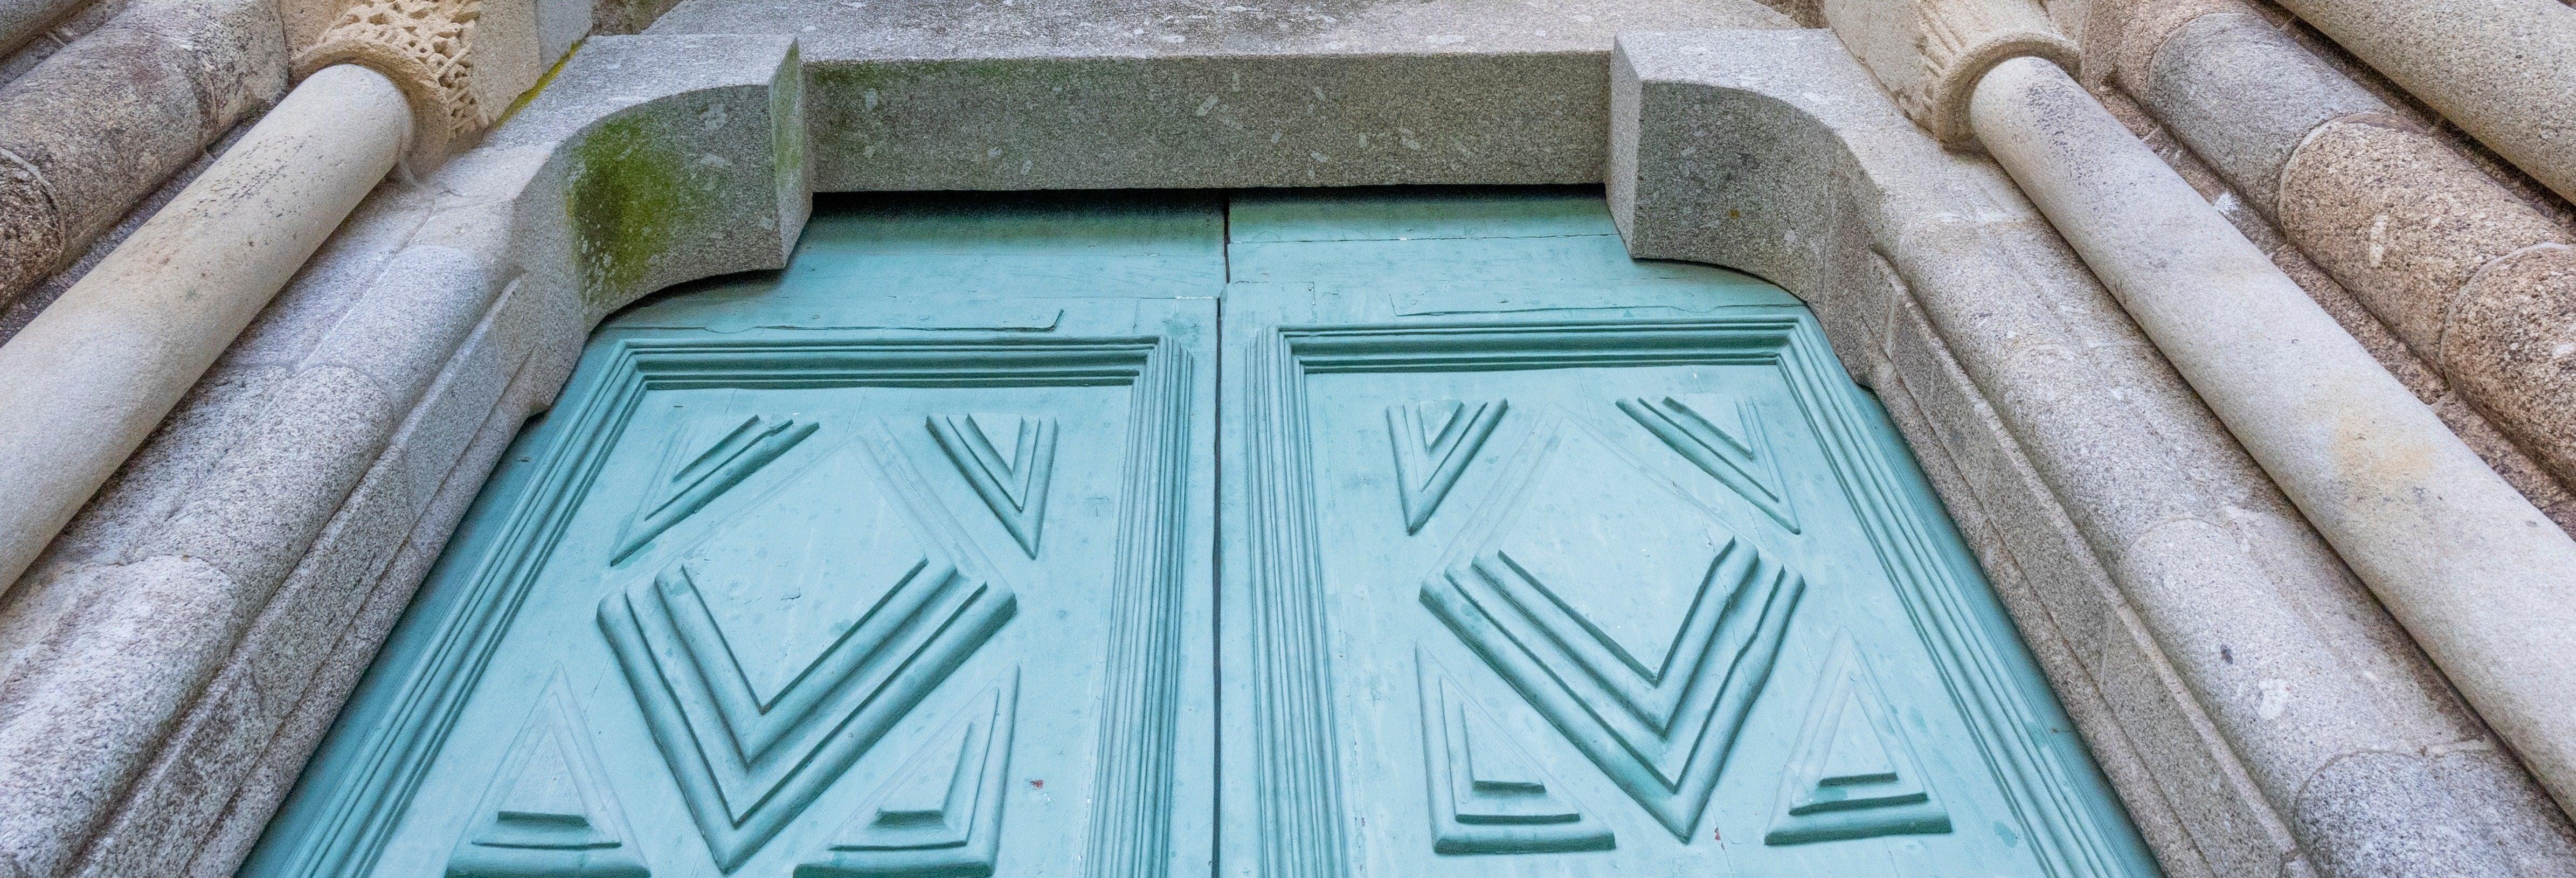 Entrada al monasterio de Santa María de Pombeiro